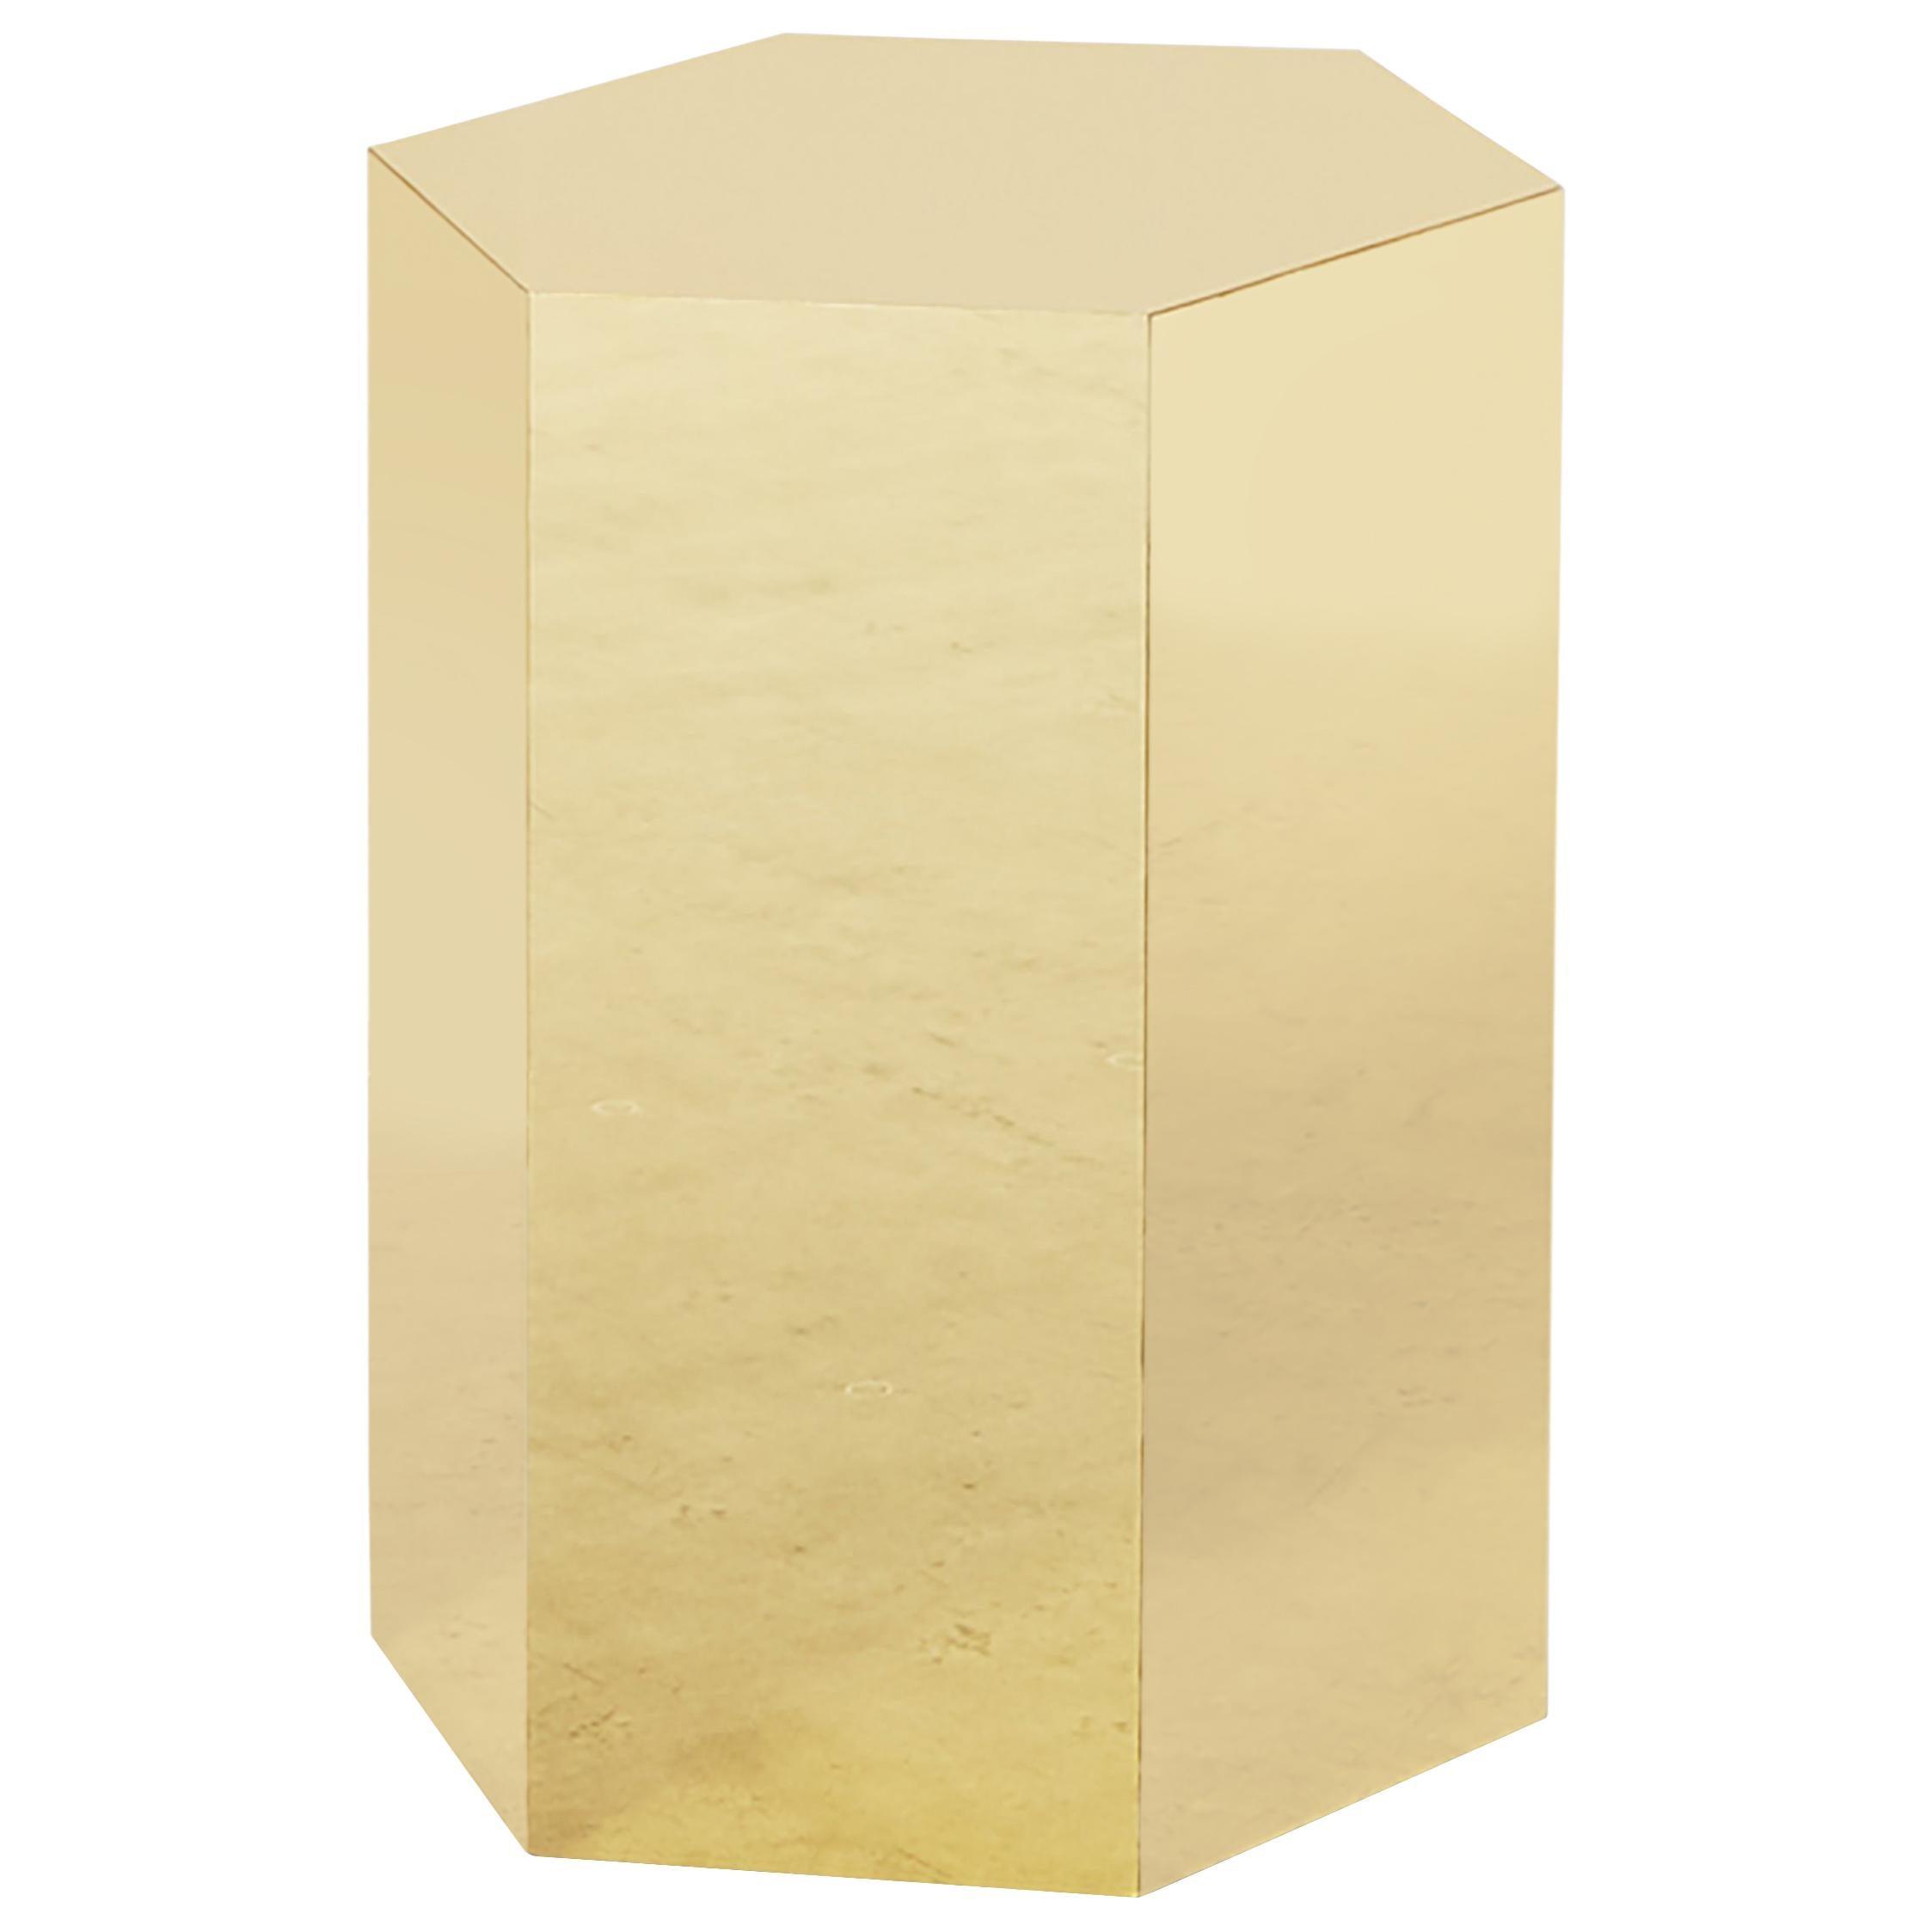 Shiny Hex Brass Finish Side Table by Slash Objects